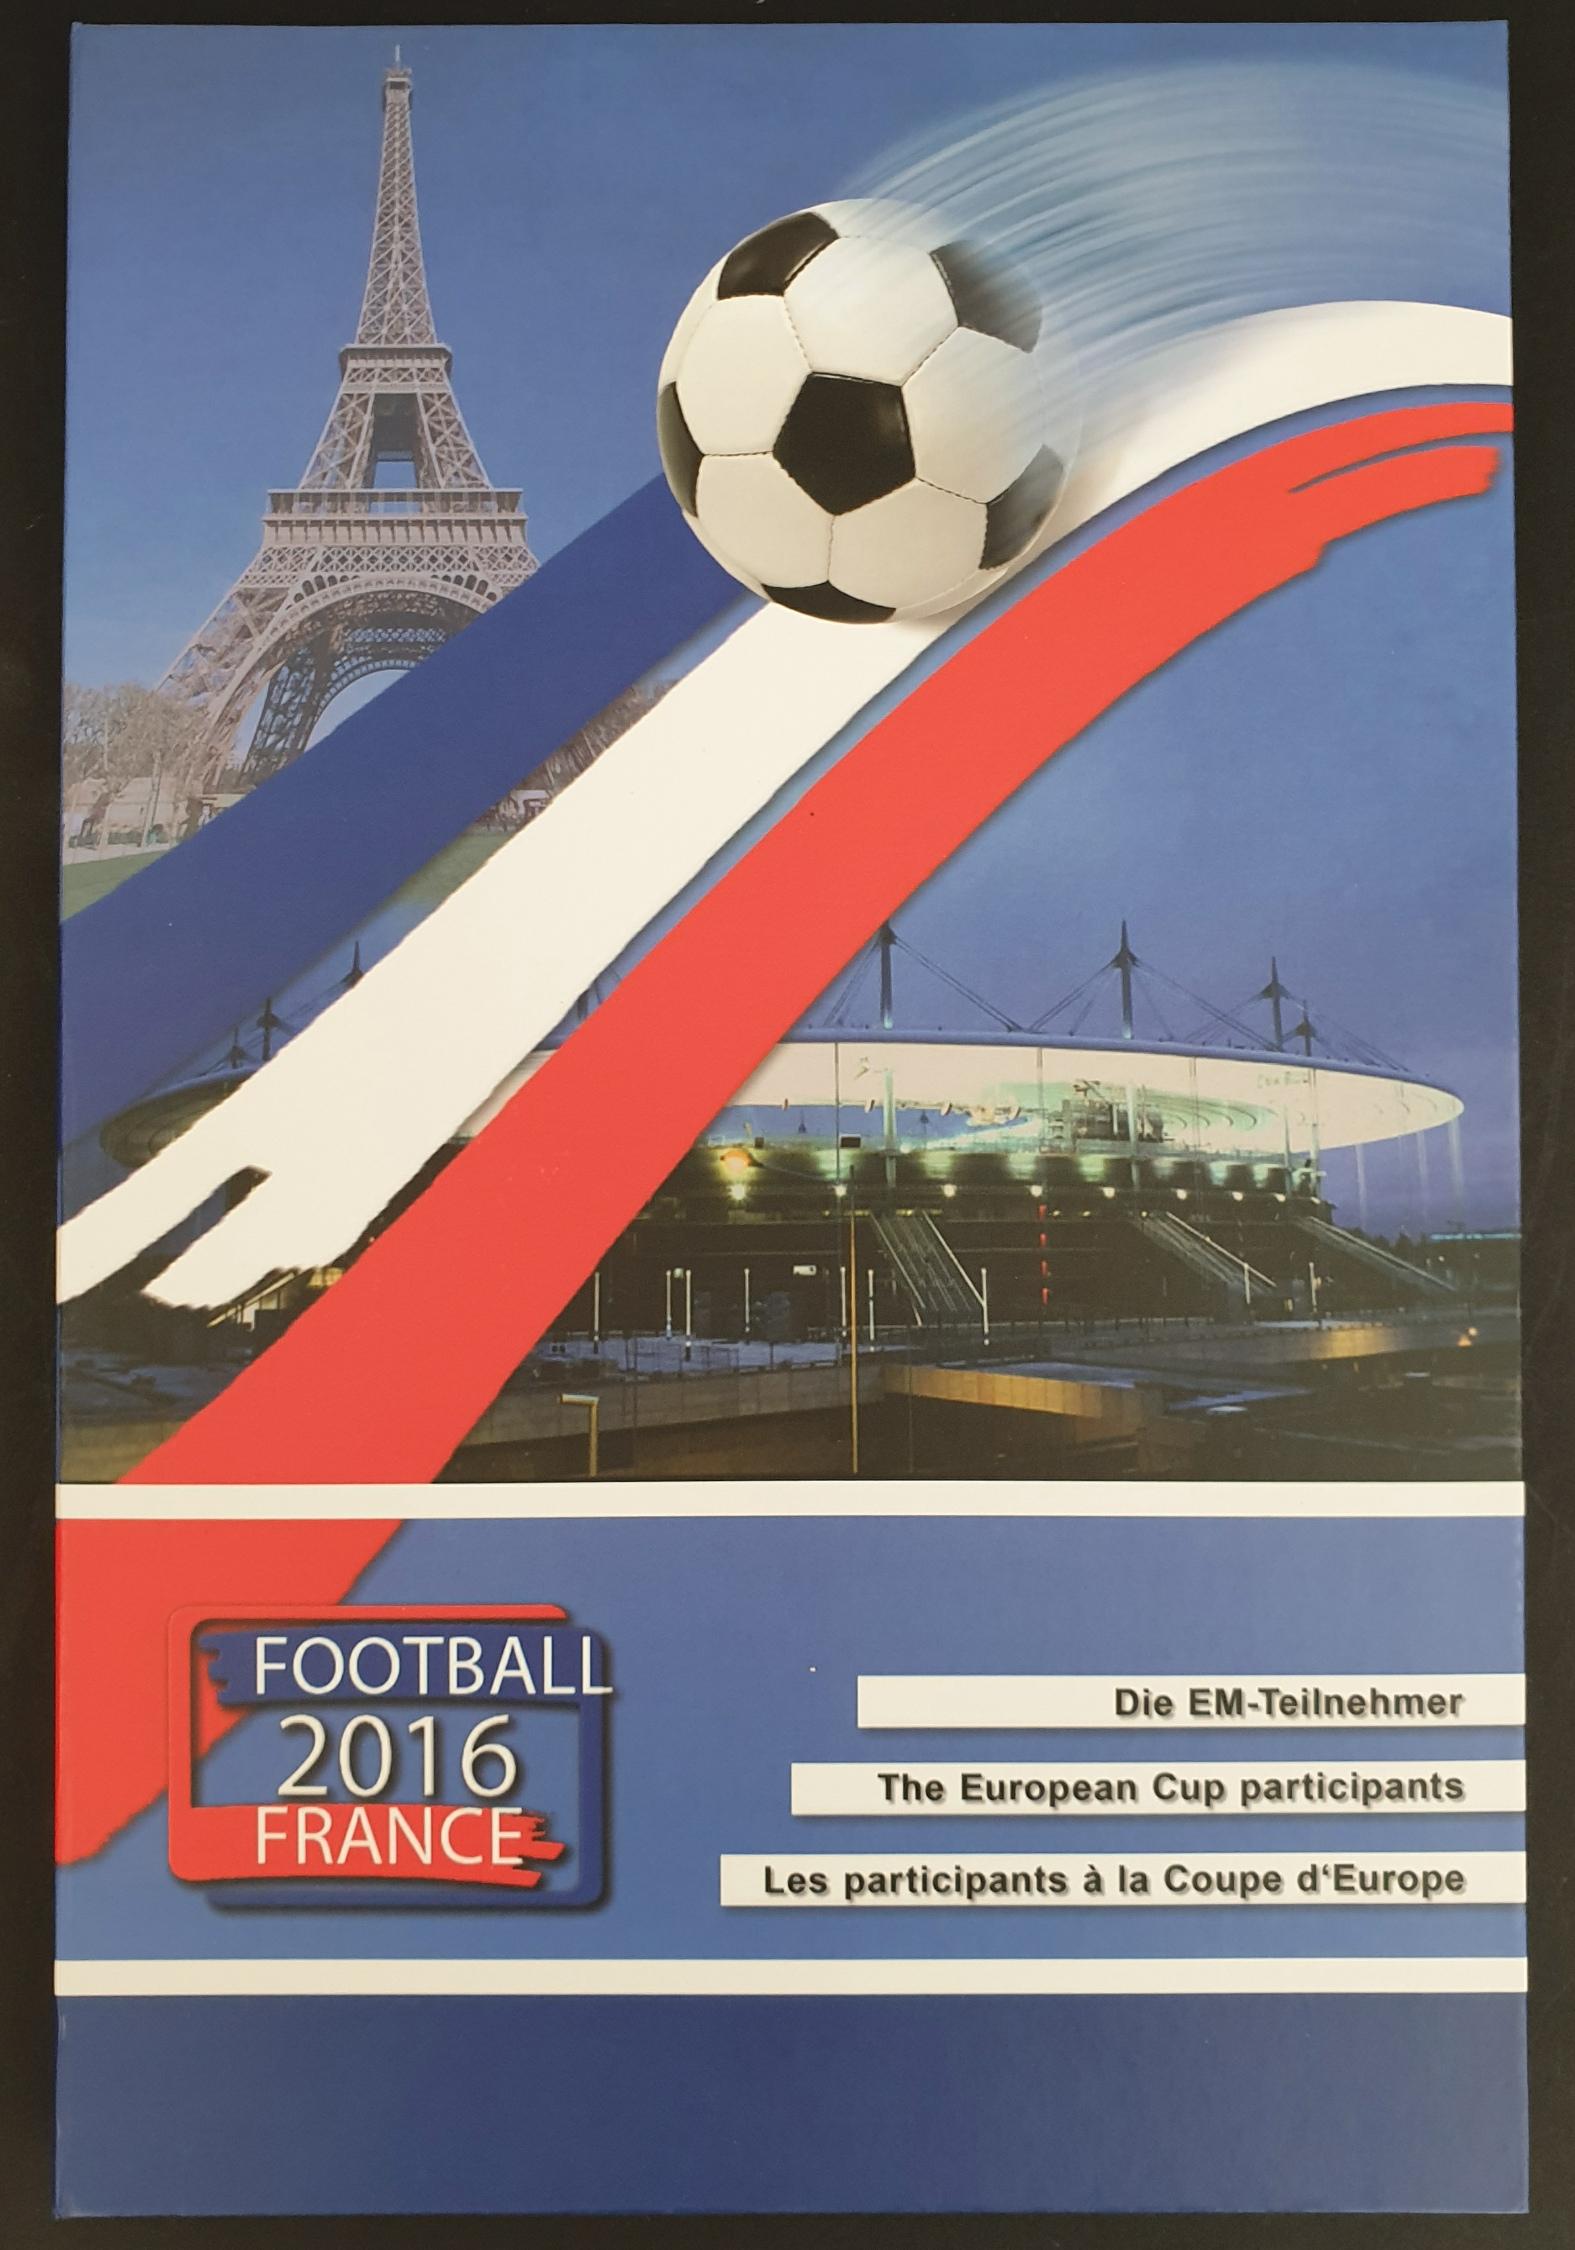 Collectable Coins European Cup Participants France 2016Trinitas - Image 2 of 2